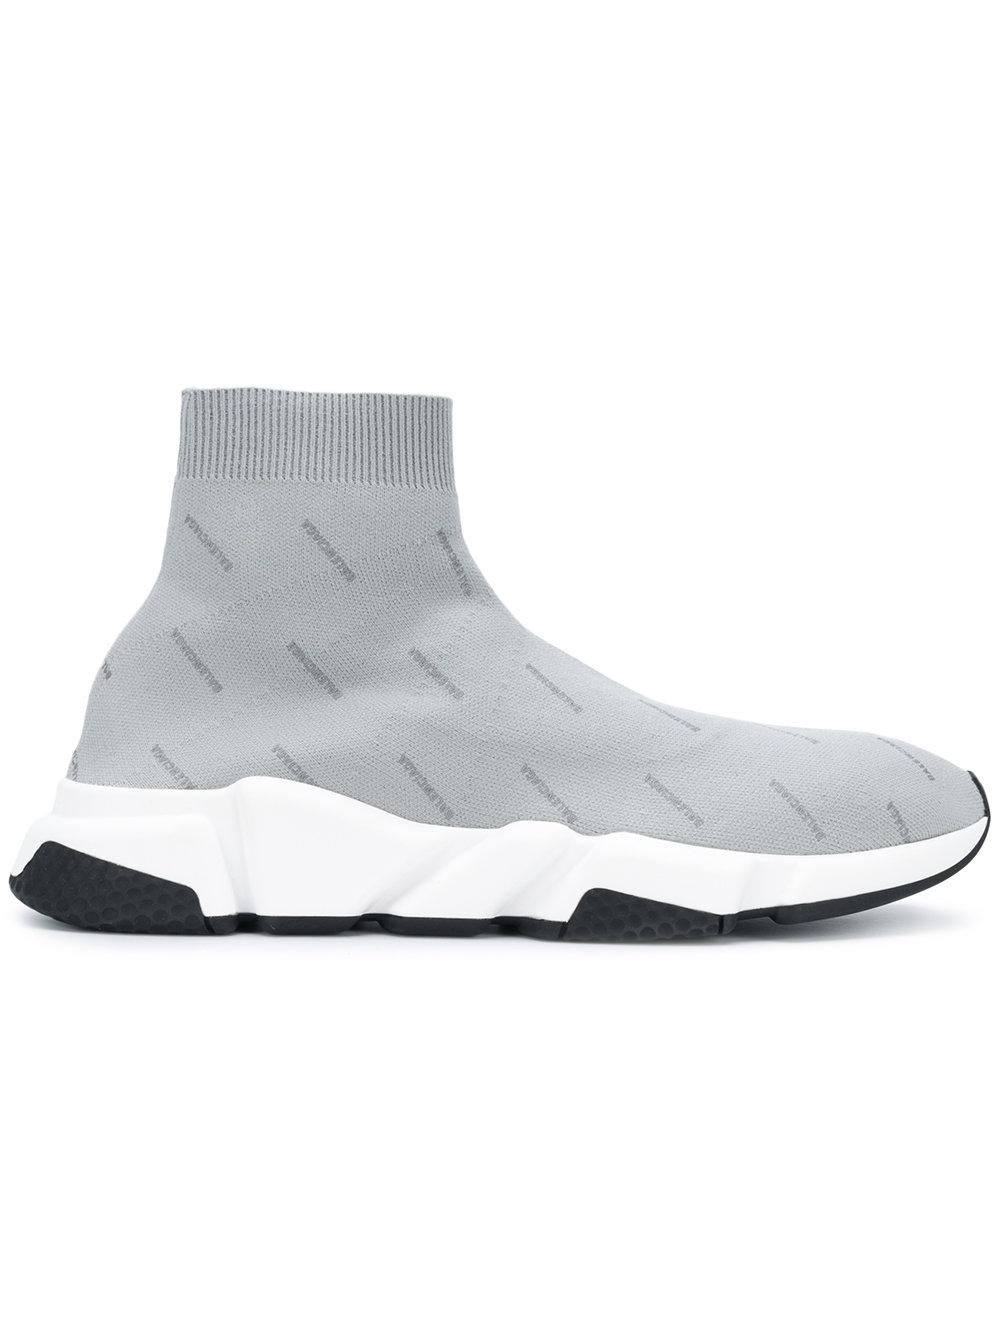 Sneakers Balenciaga Low Logo grijs Speed 512527w0650 x8tqYtvw